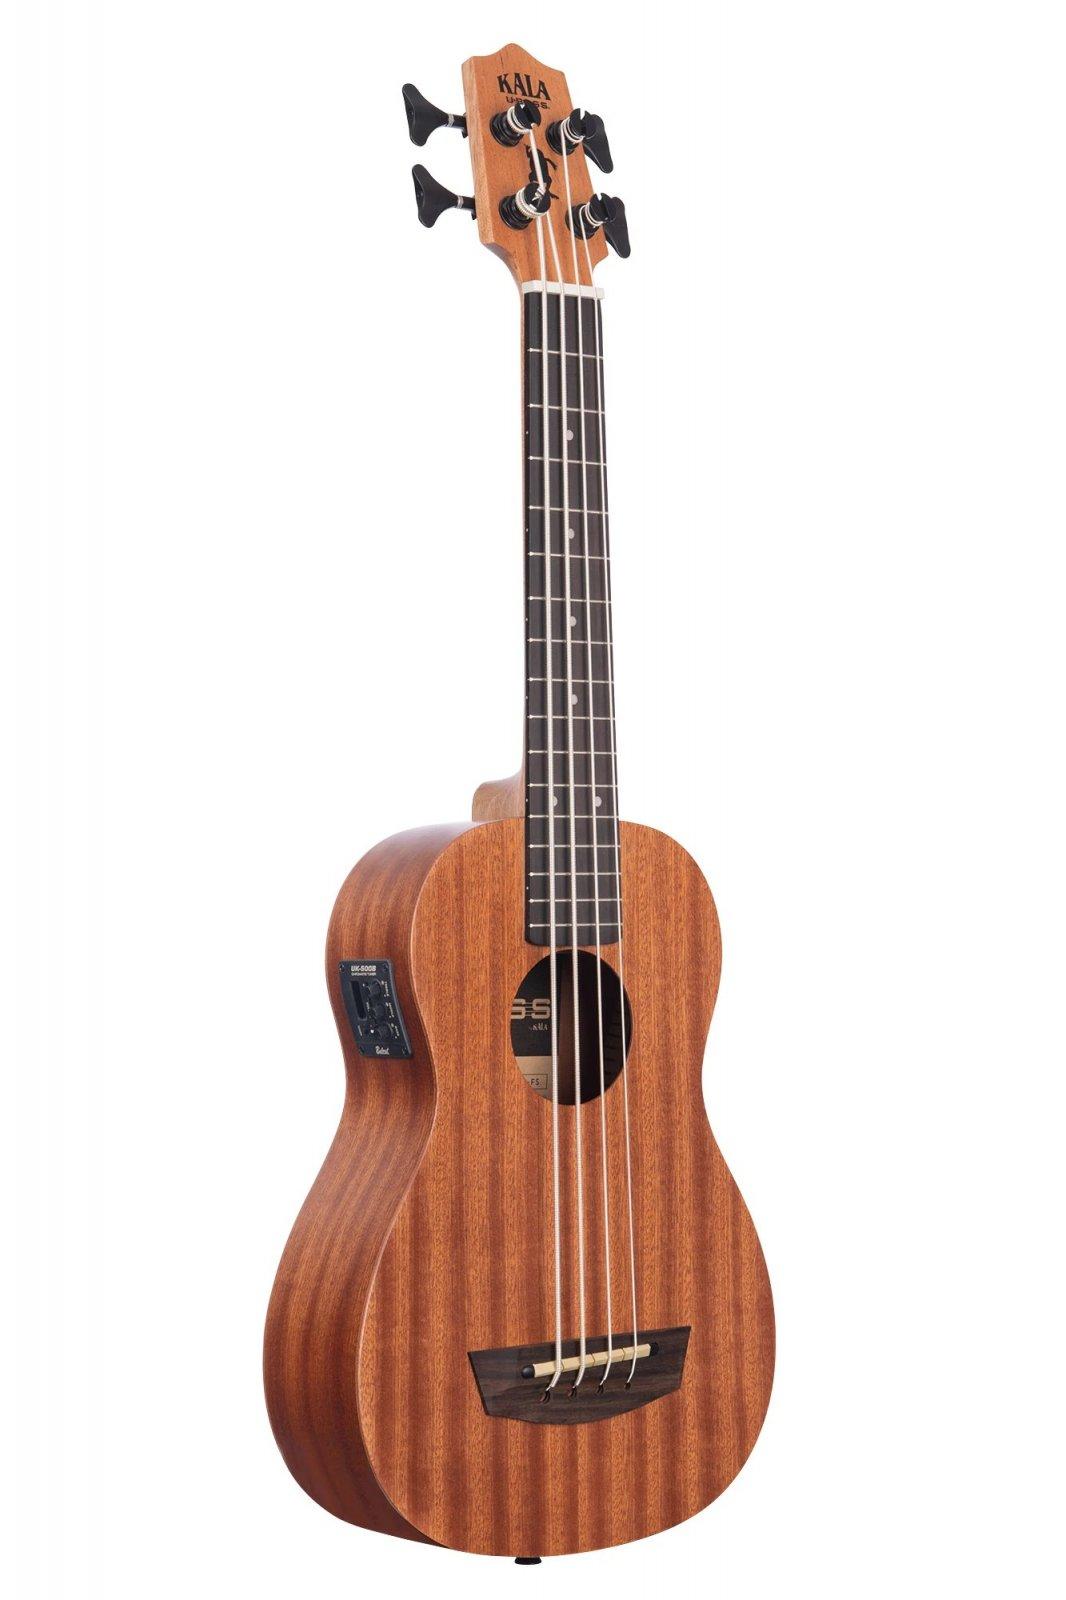 Kala UBASS-WNDR-FS Wanderer Acoustic-Electric U-Bass Includes Gig Bag